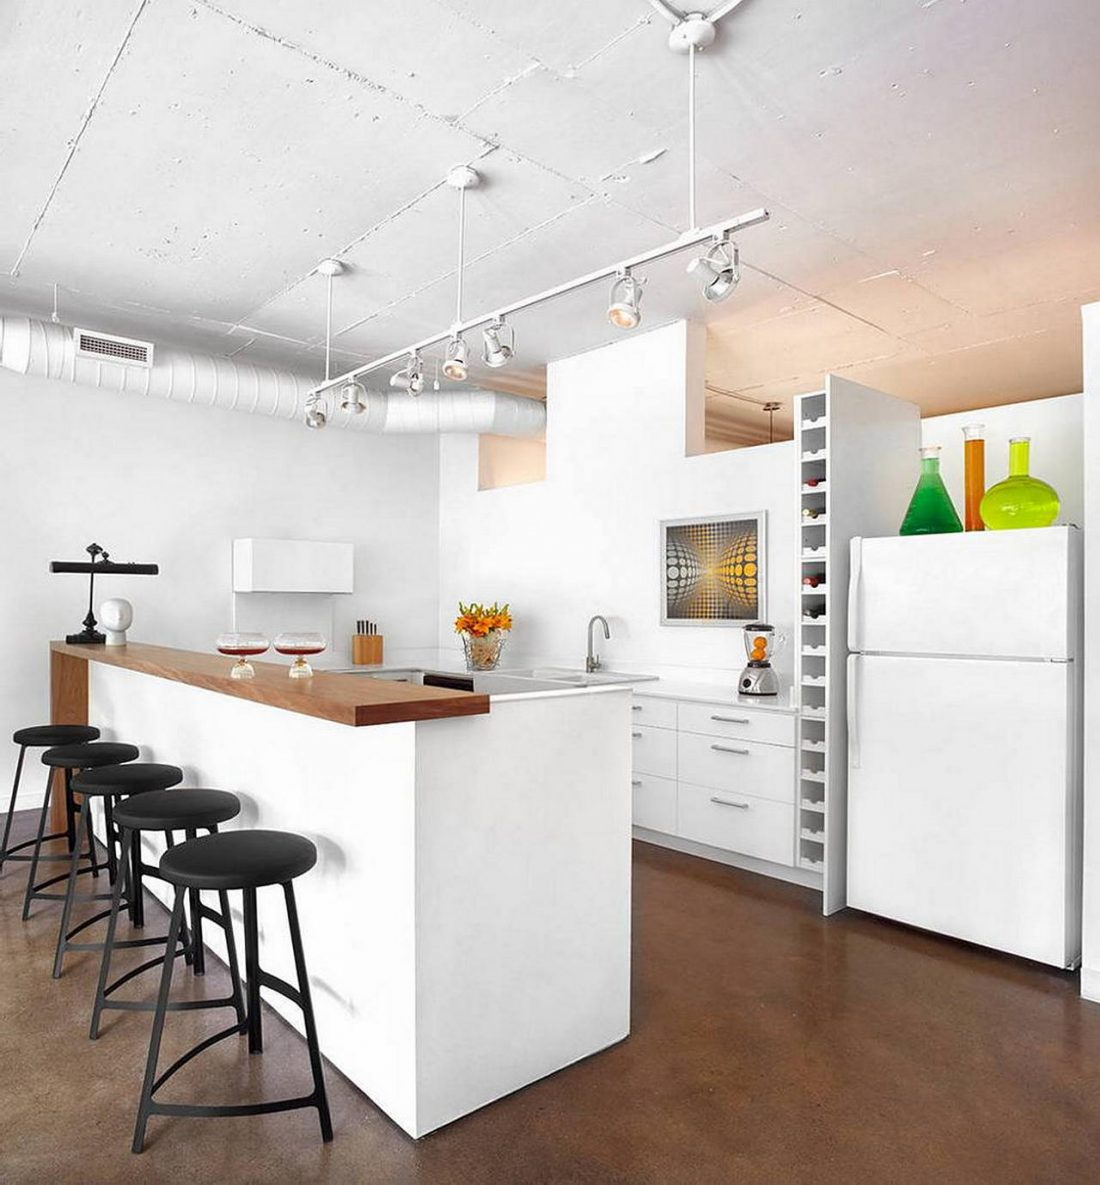 Дизайн интерьера квартиры в стиле лофт 32